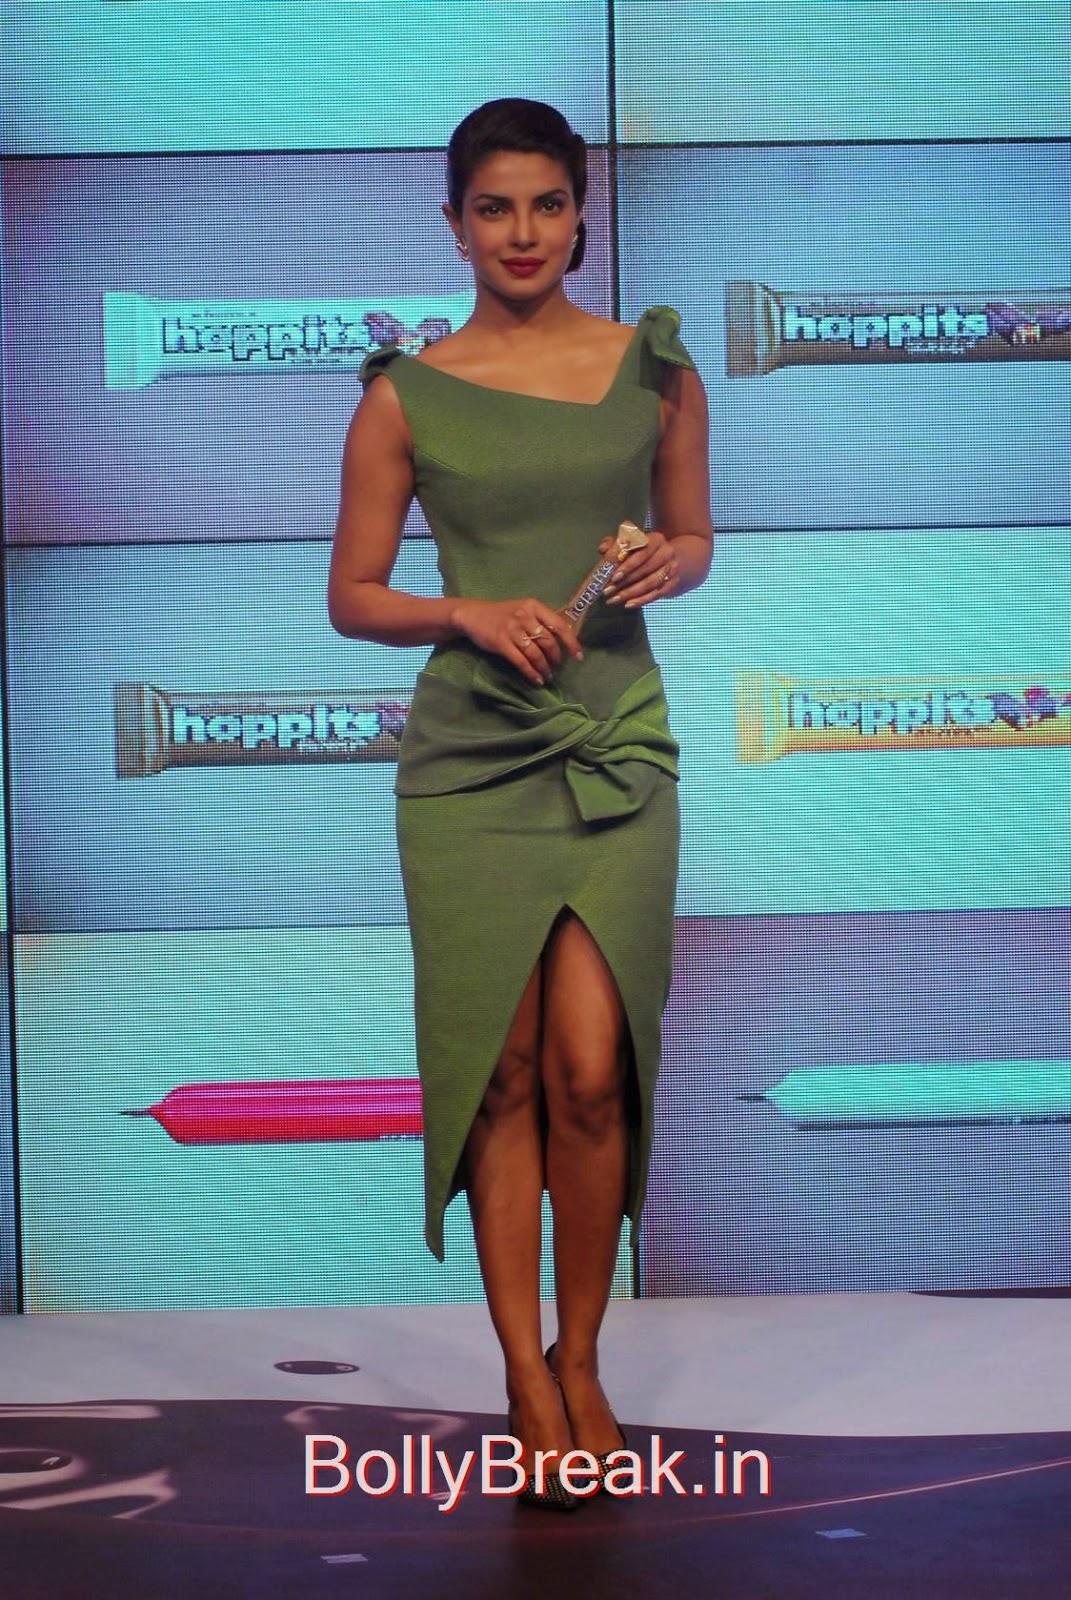 Bollywood Actress Priyanka Chopra, Priyanka Chopra Hot Pics in green dress from Hoppit Chocolate Launch